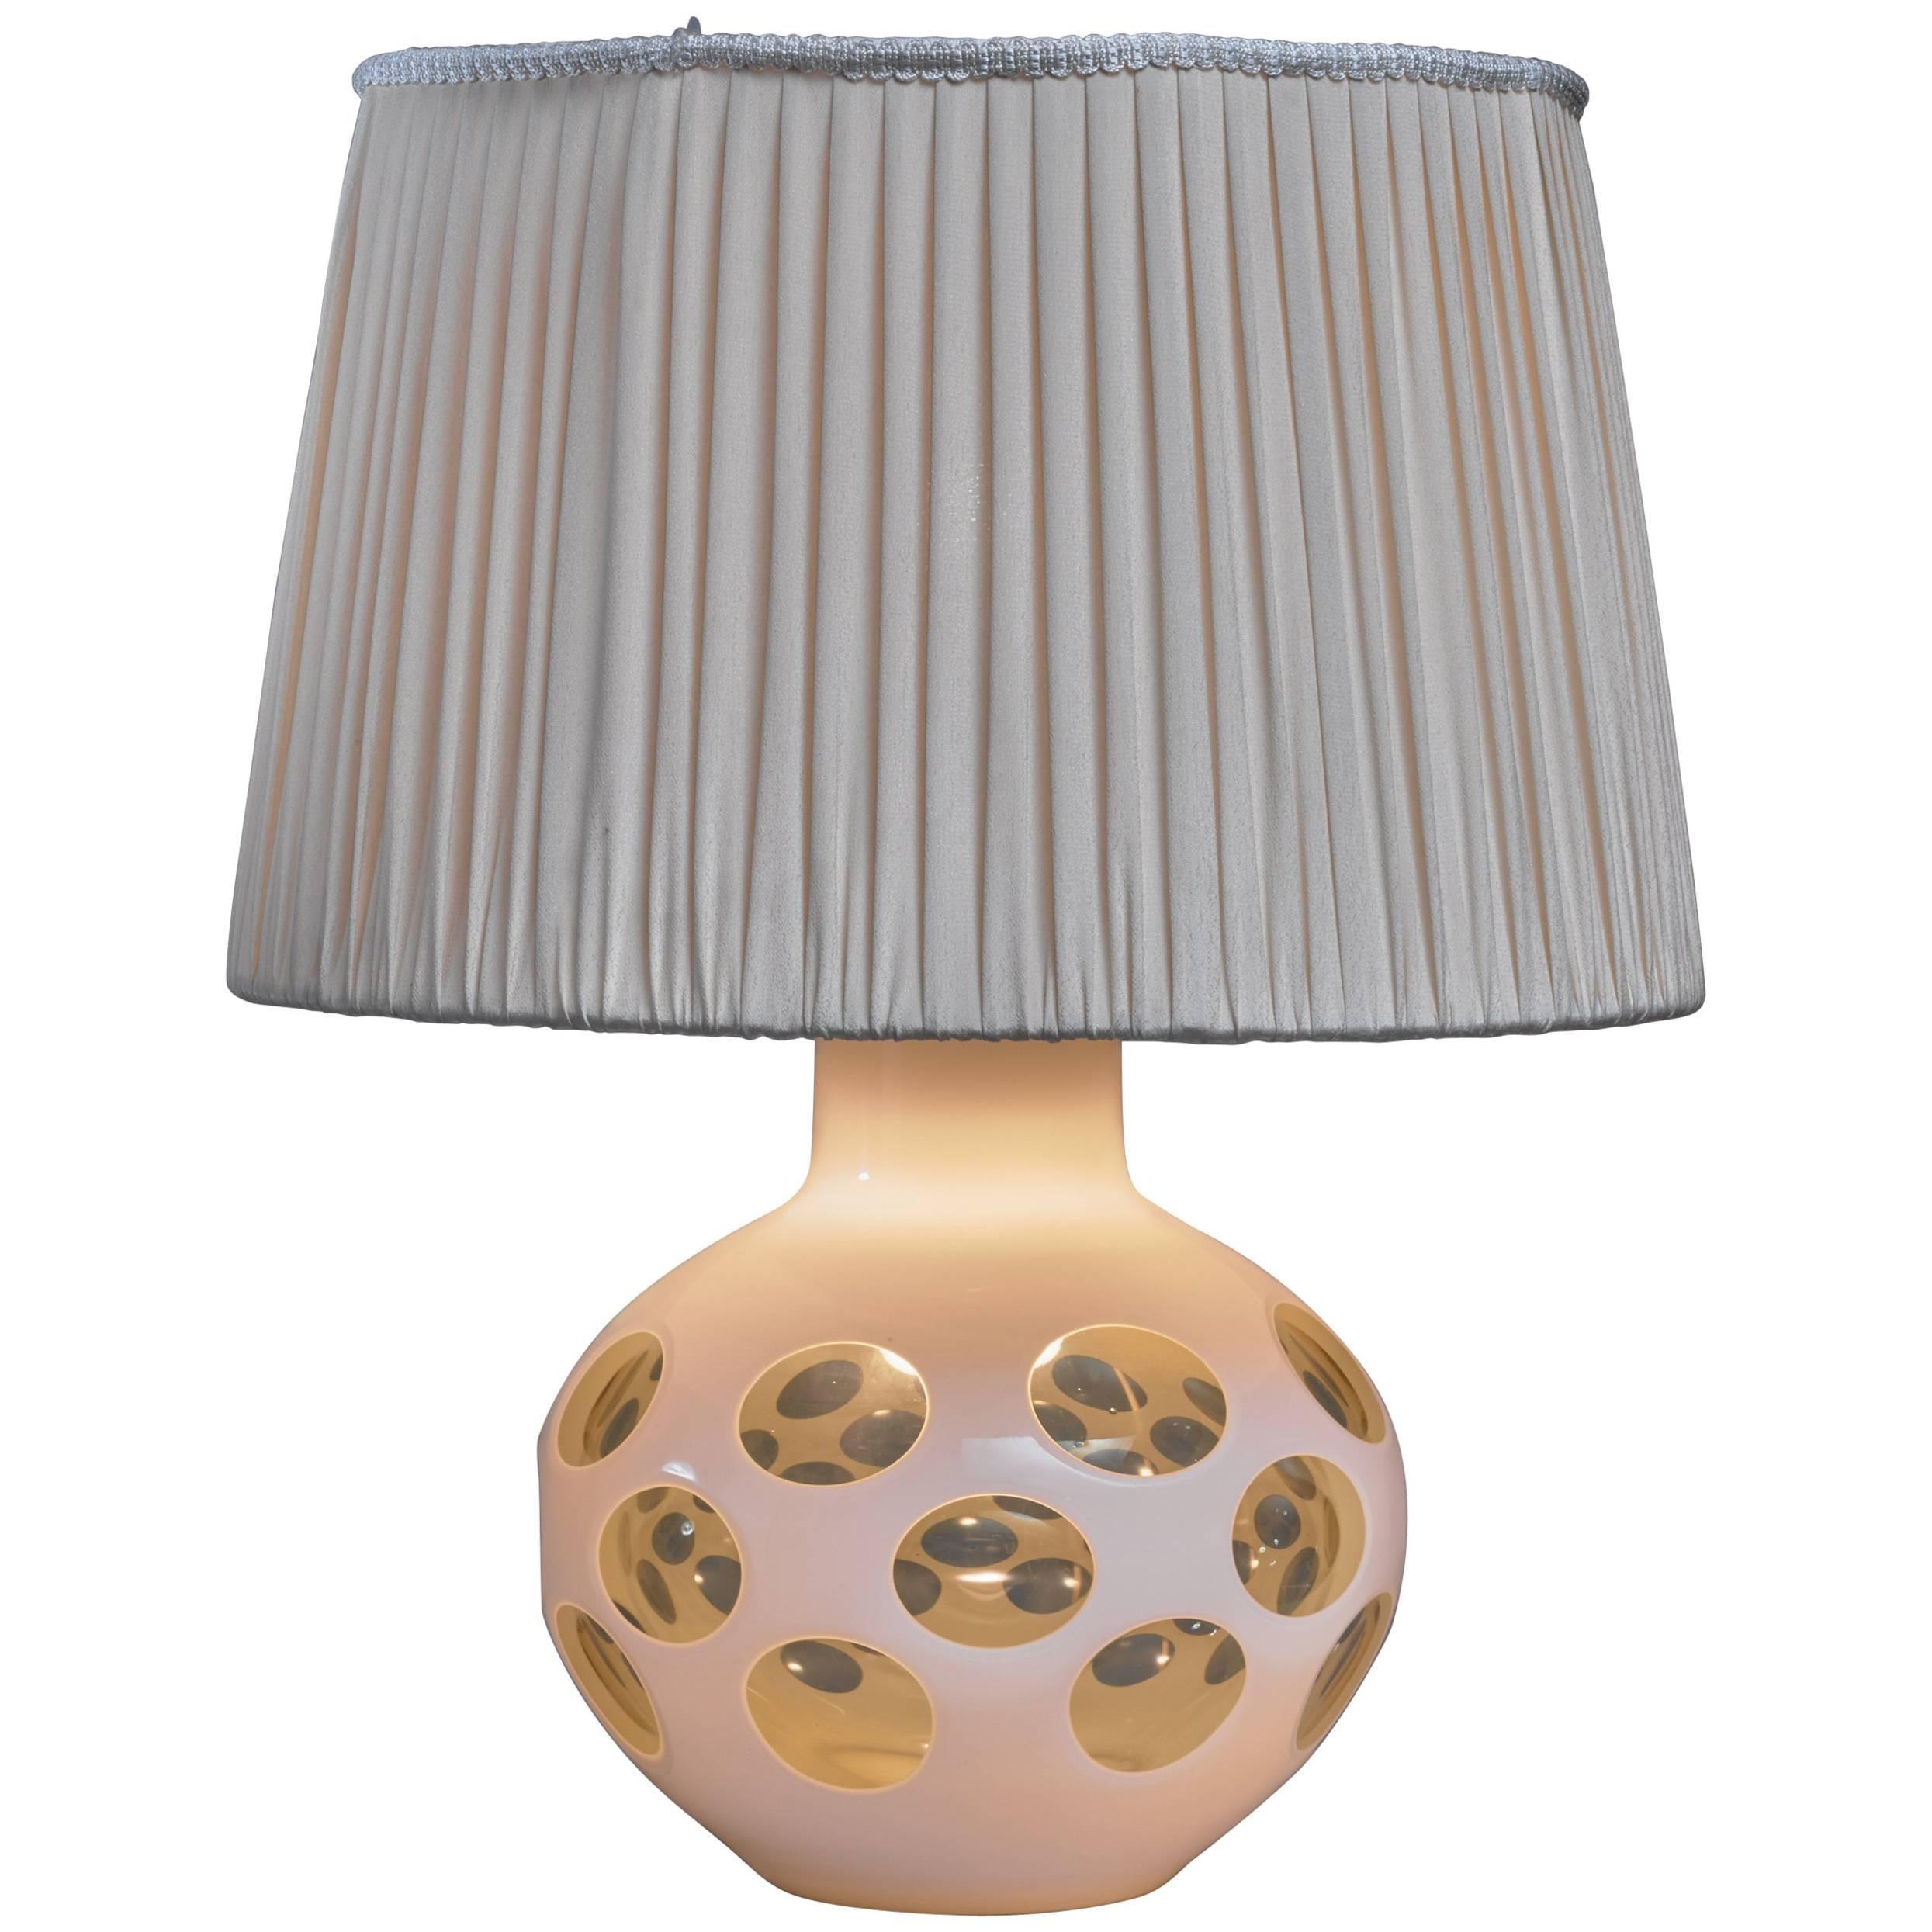 Carlo Nason Glass Table Lamp for Mazzega, Italy, 1970s